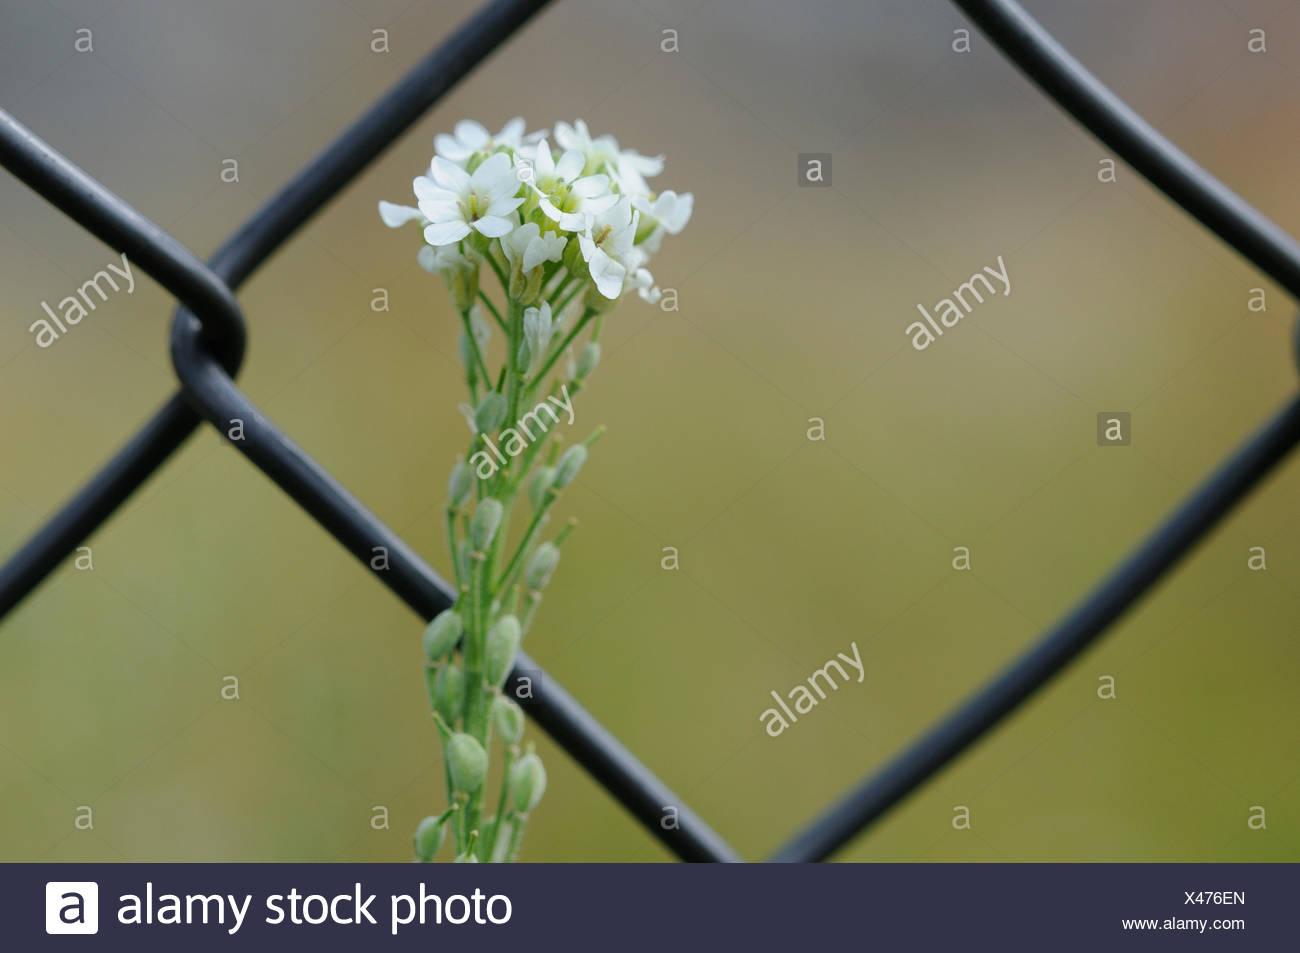 Floración alison canosos detrás de valla Foto de stock